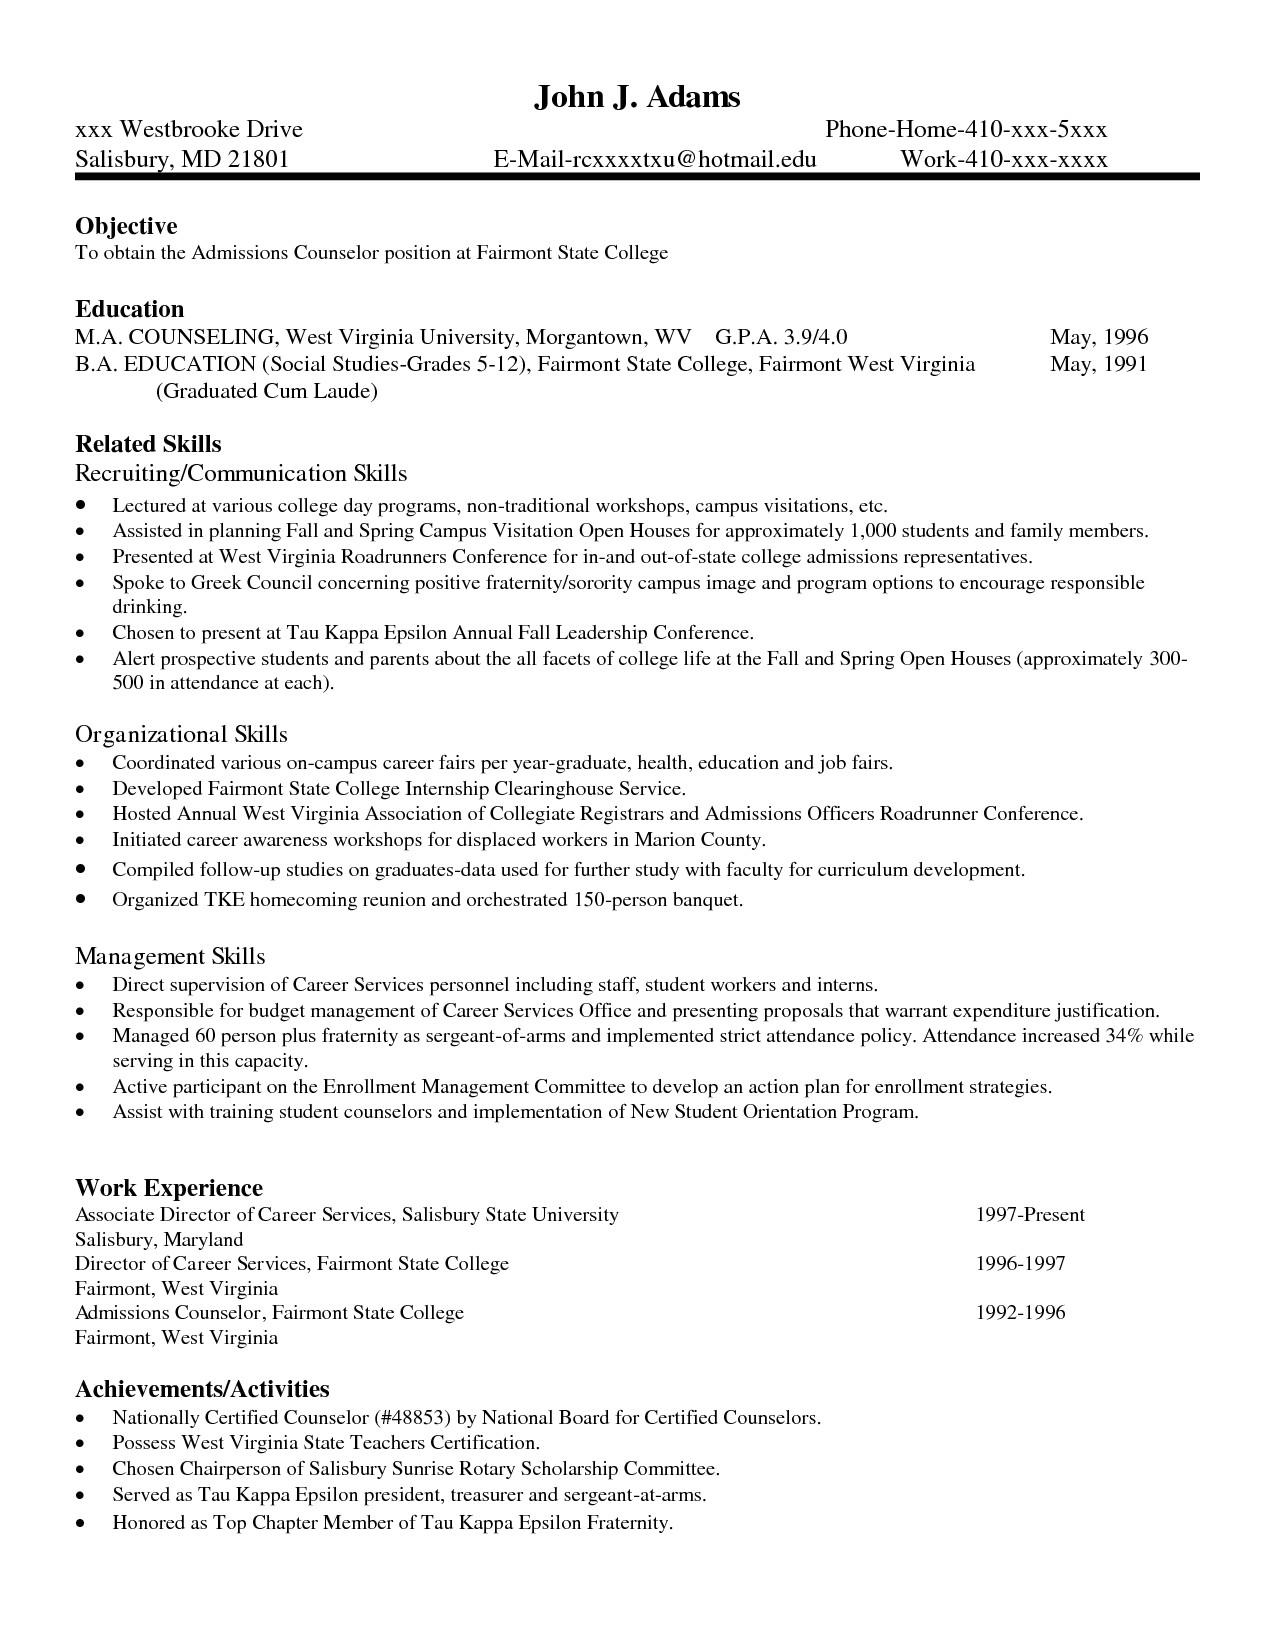 Sample Skills for Resume Skills Resume Free Excel Templates